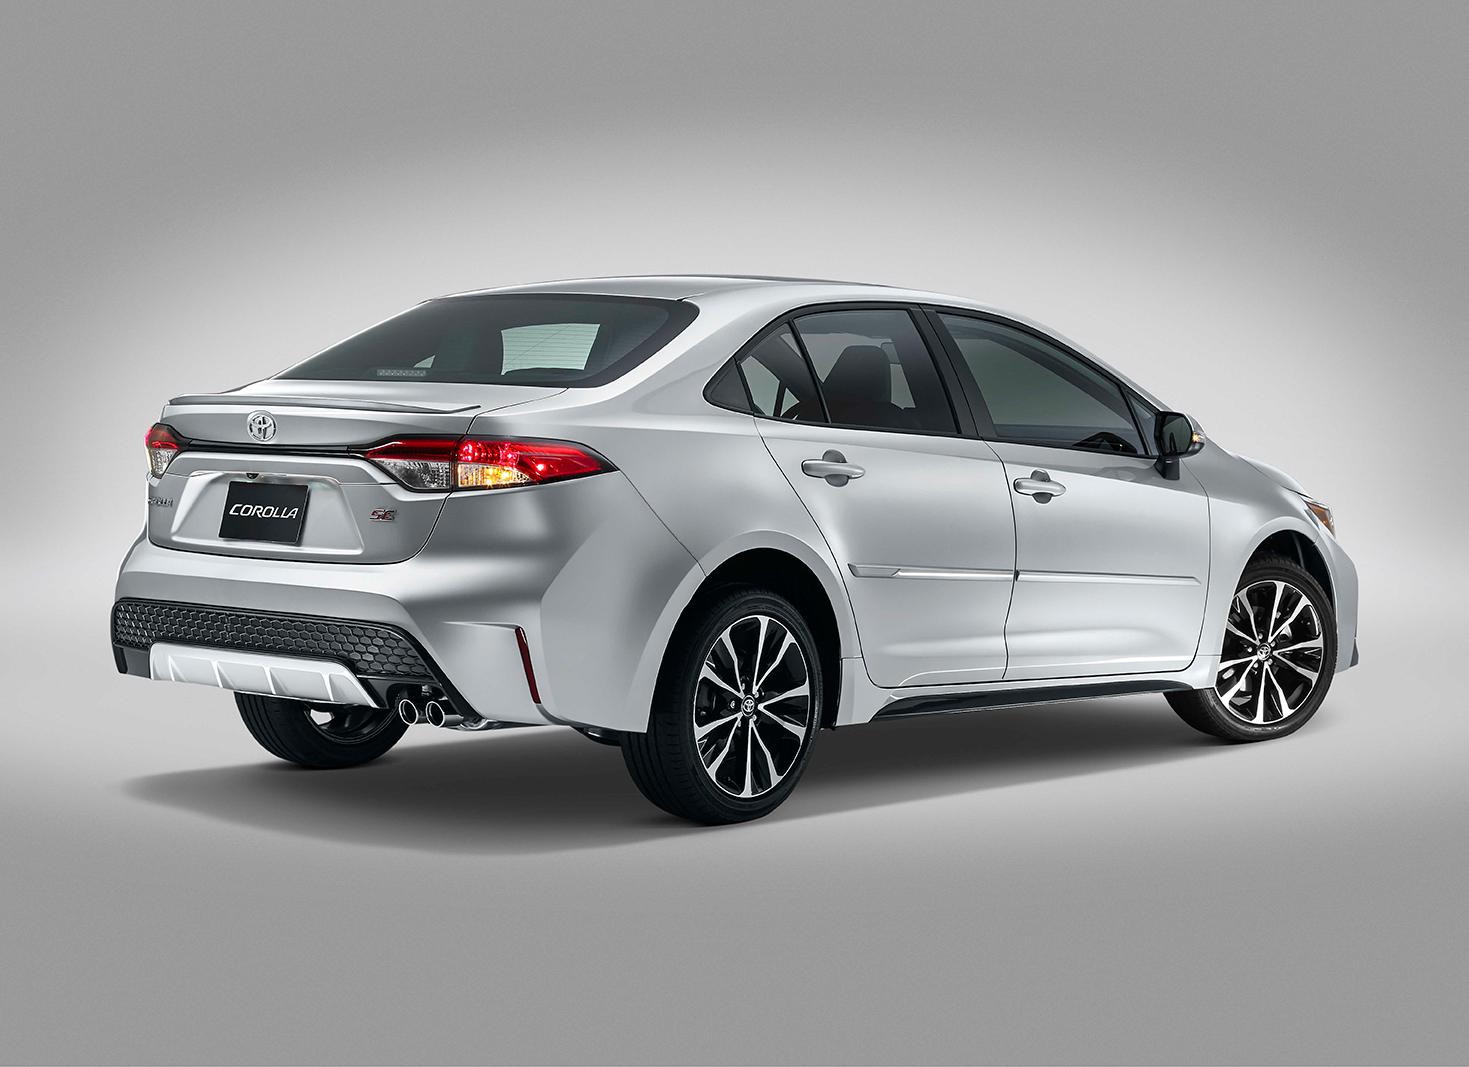 Toyota Corolla 2020 exterior diseño posterior de lado